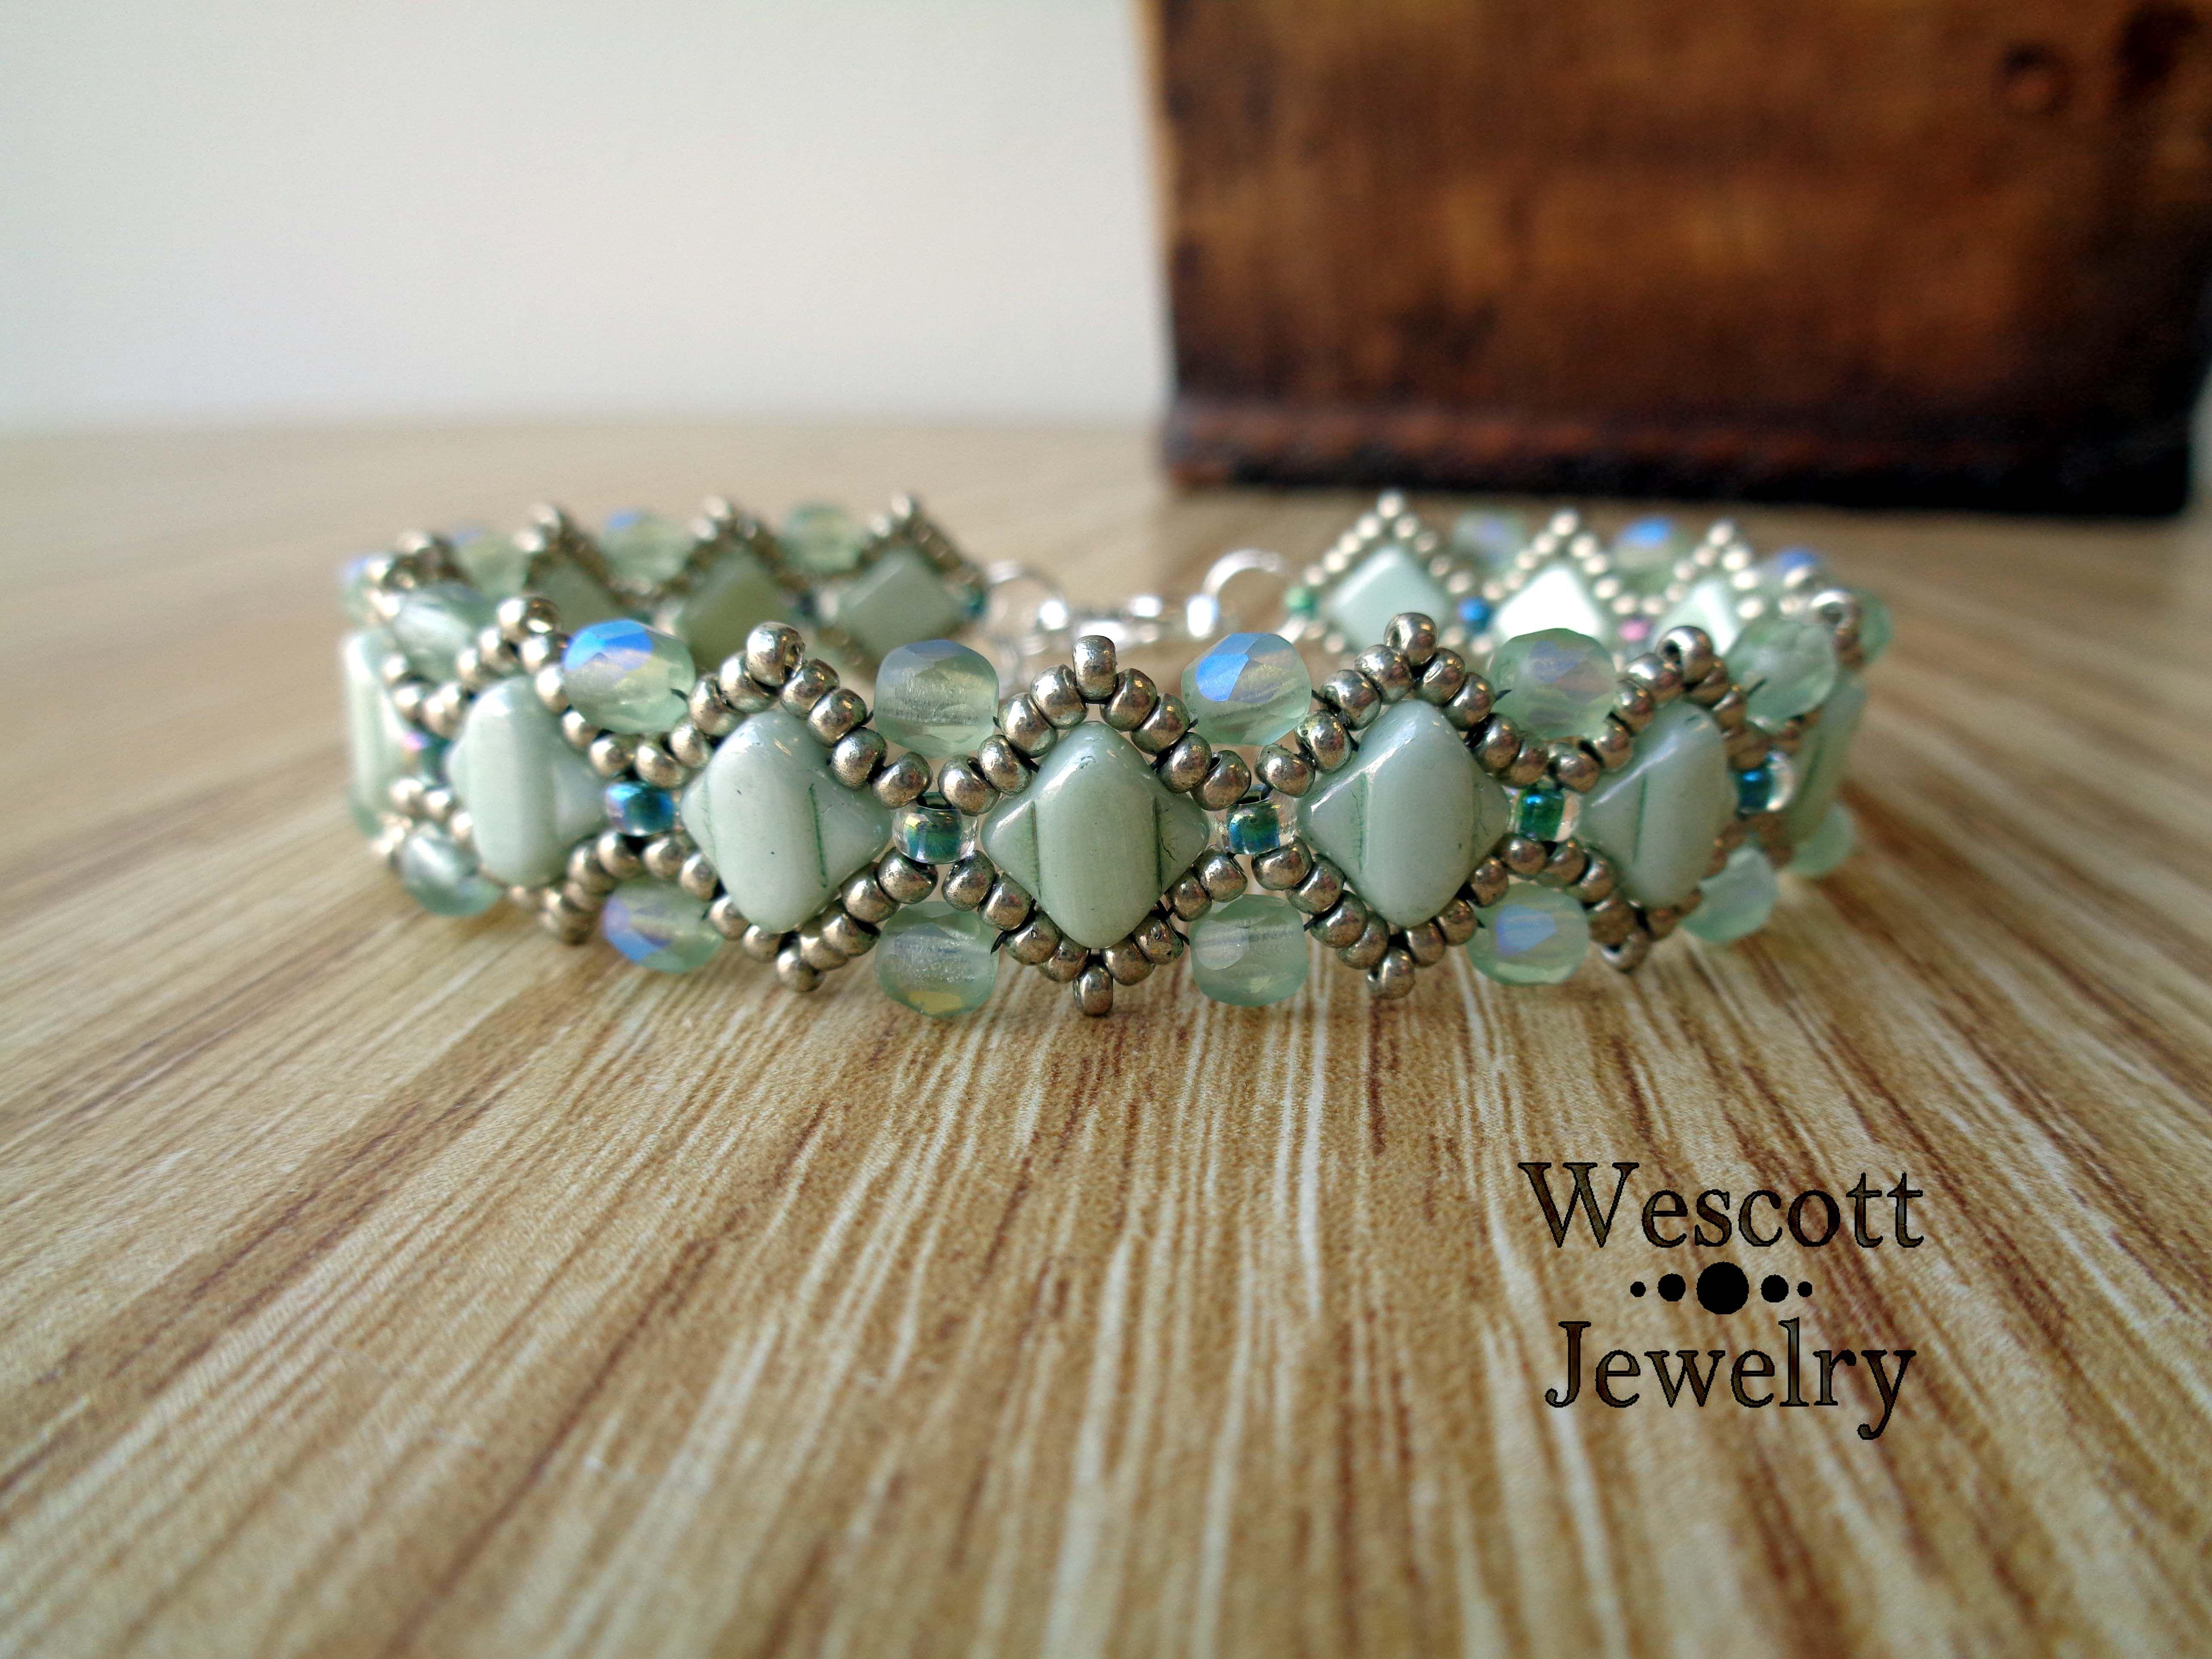 Dsc silky pinterest beads bead weaving and bracelet patterns